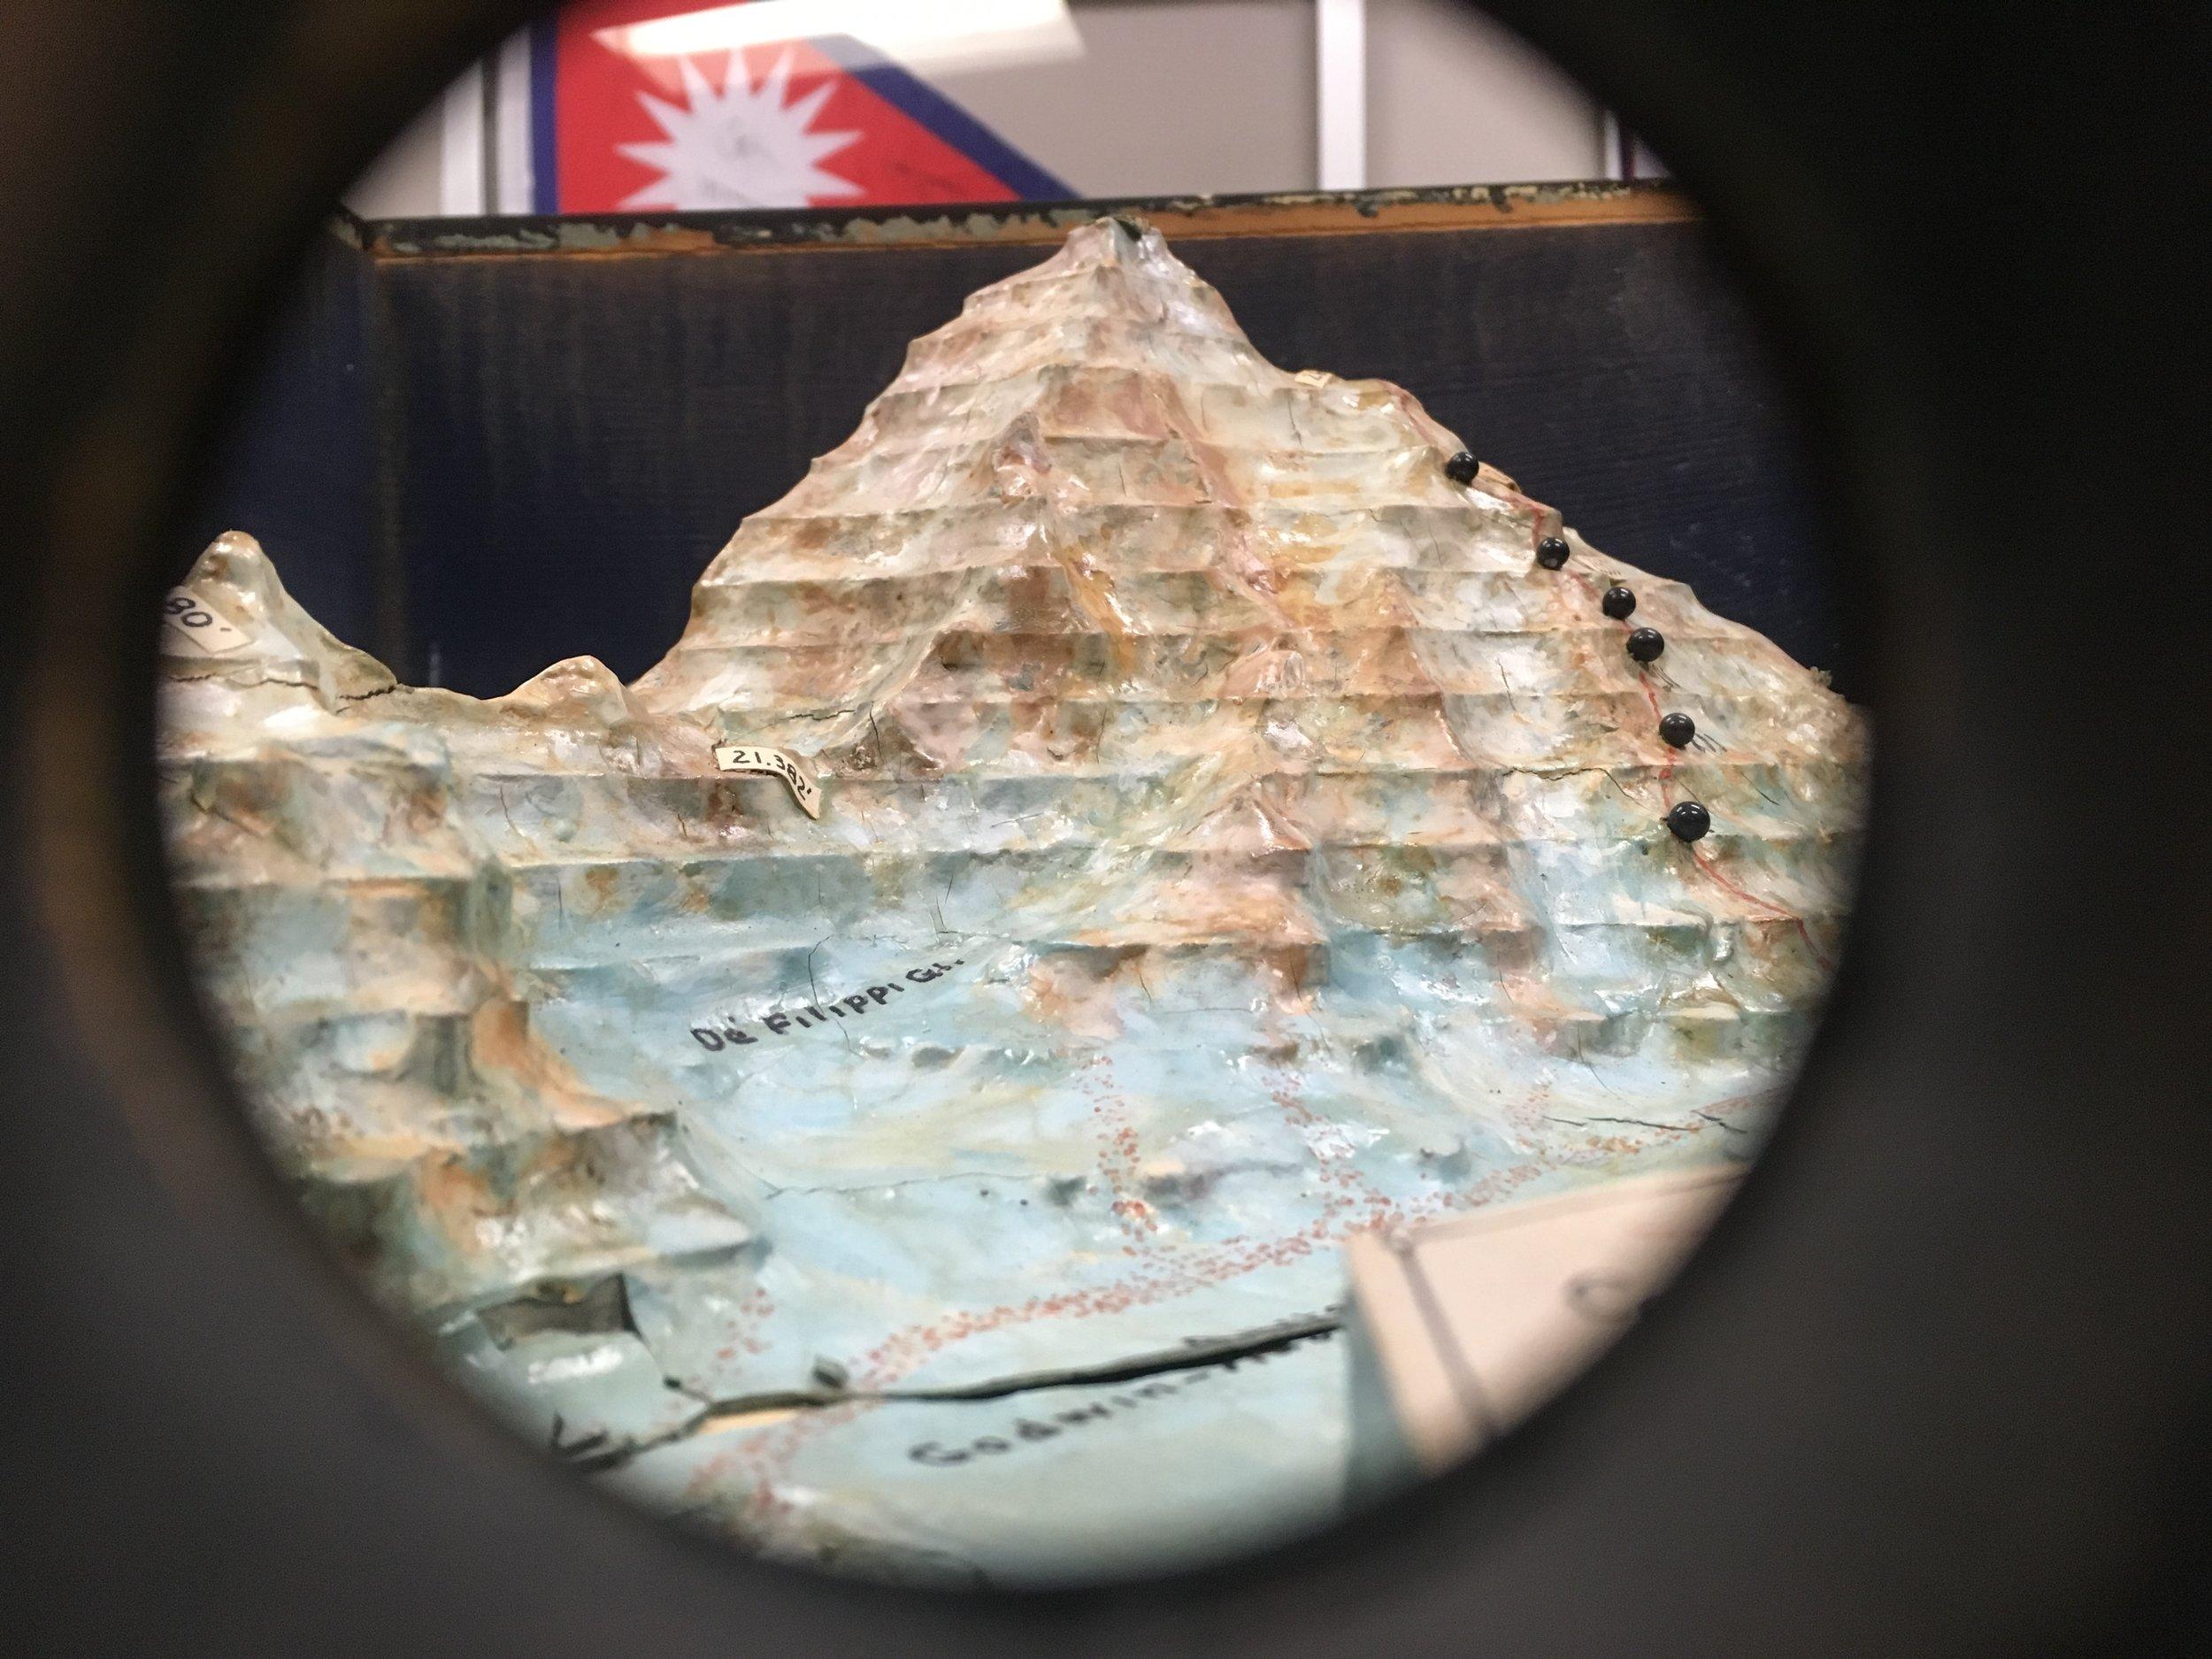 A view through the peephole